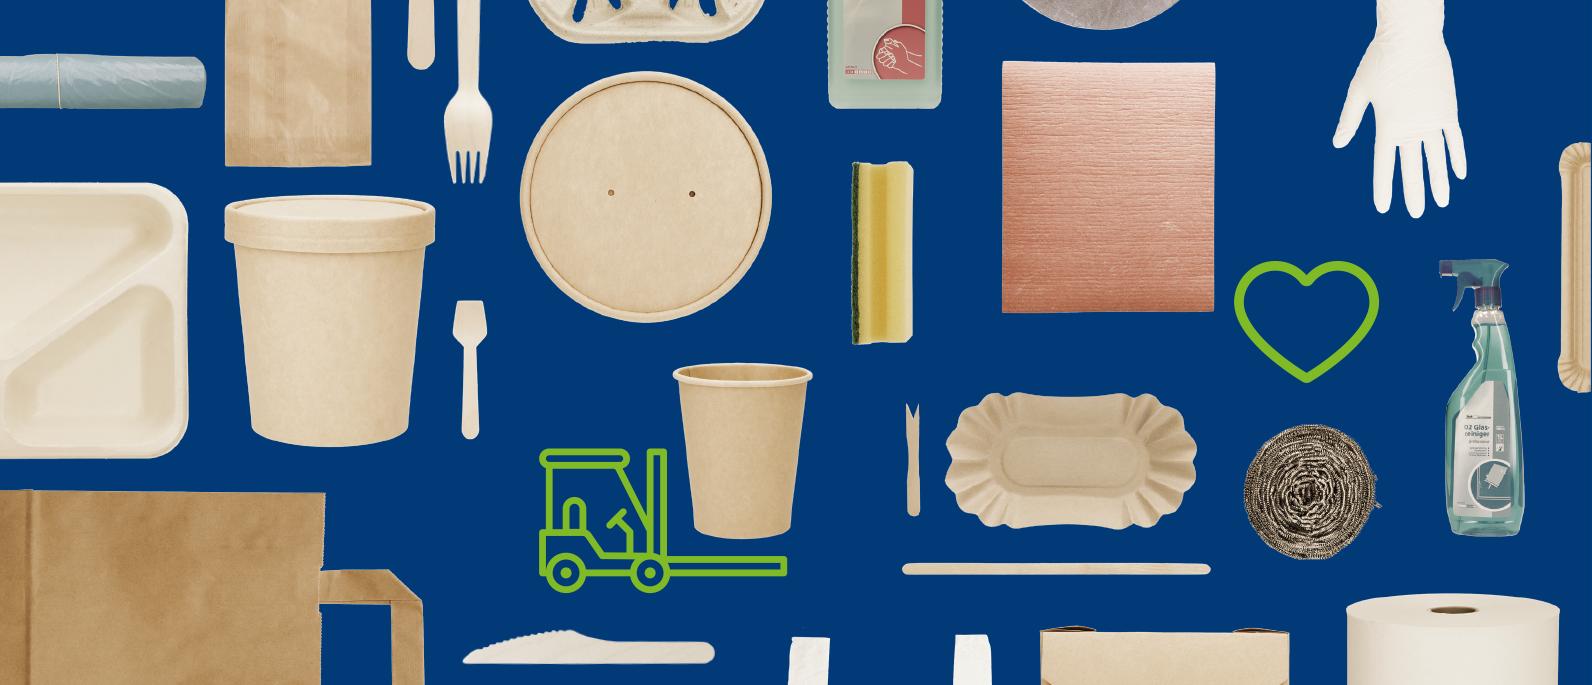 Papiertragetaschen, Suppenbecher, Birkenholzbesteck, Eislöffel, Kaffeebecher, Pommesschale, Pommesgabel, Handschuhe, Nitril-Handschuhe, Spülschwamm, Müllbeutel